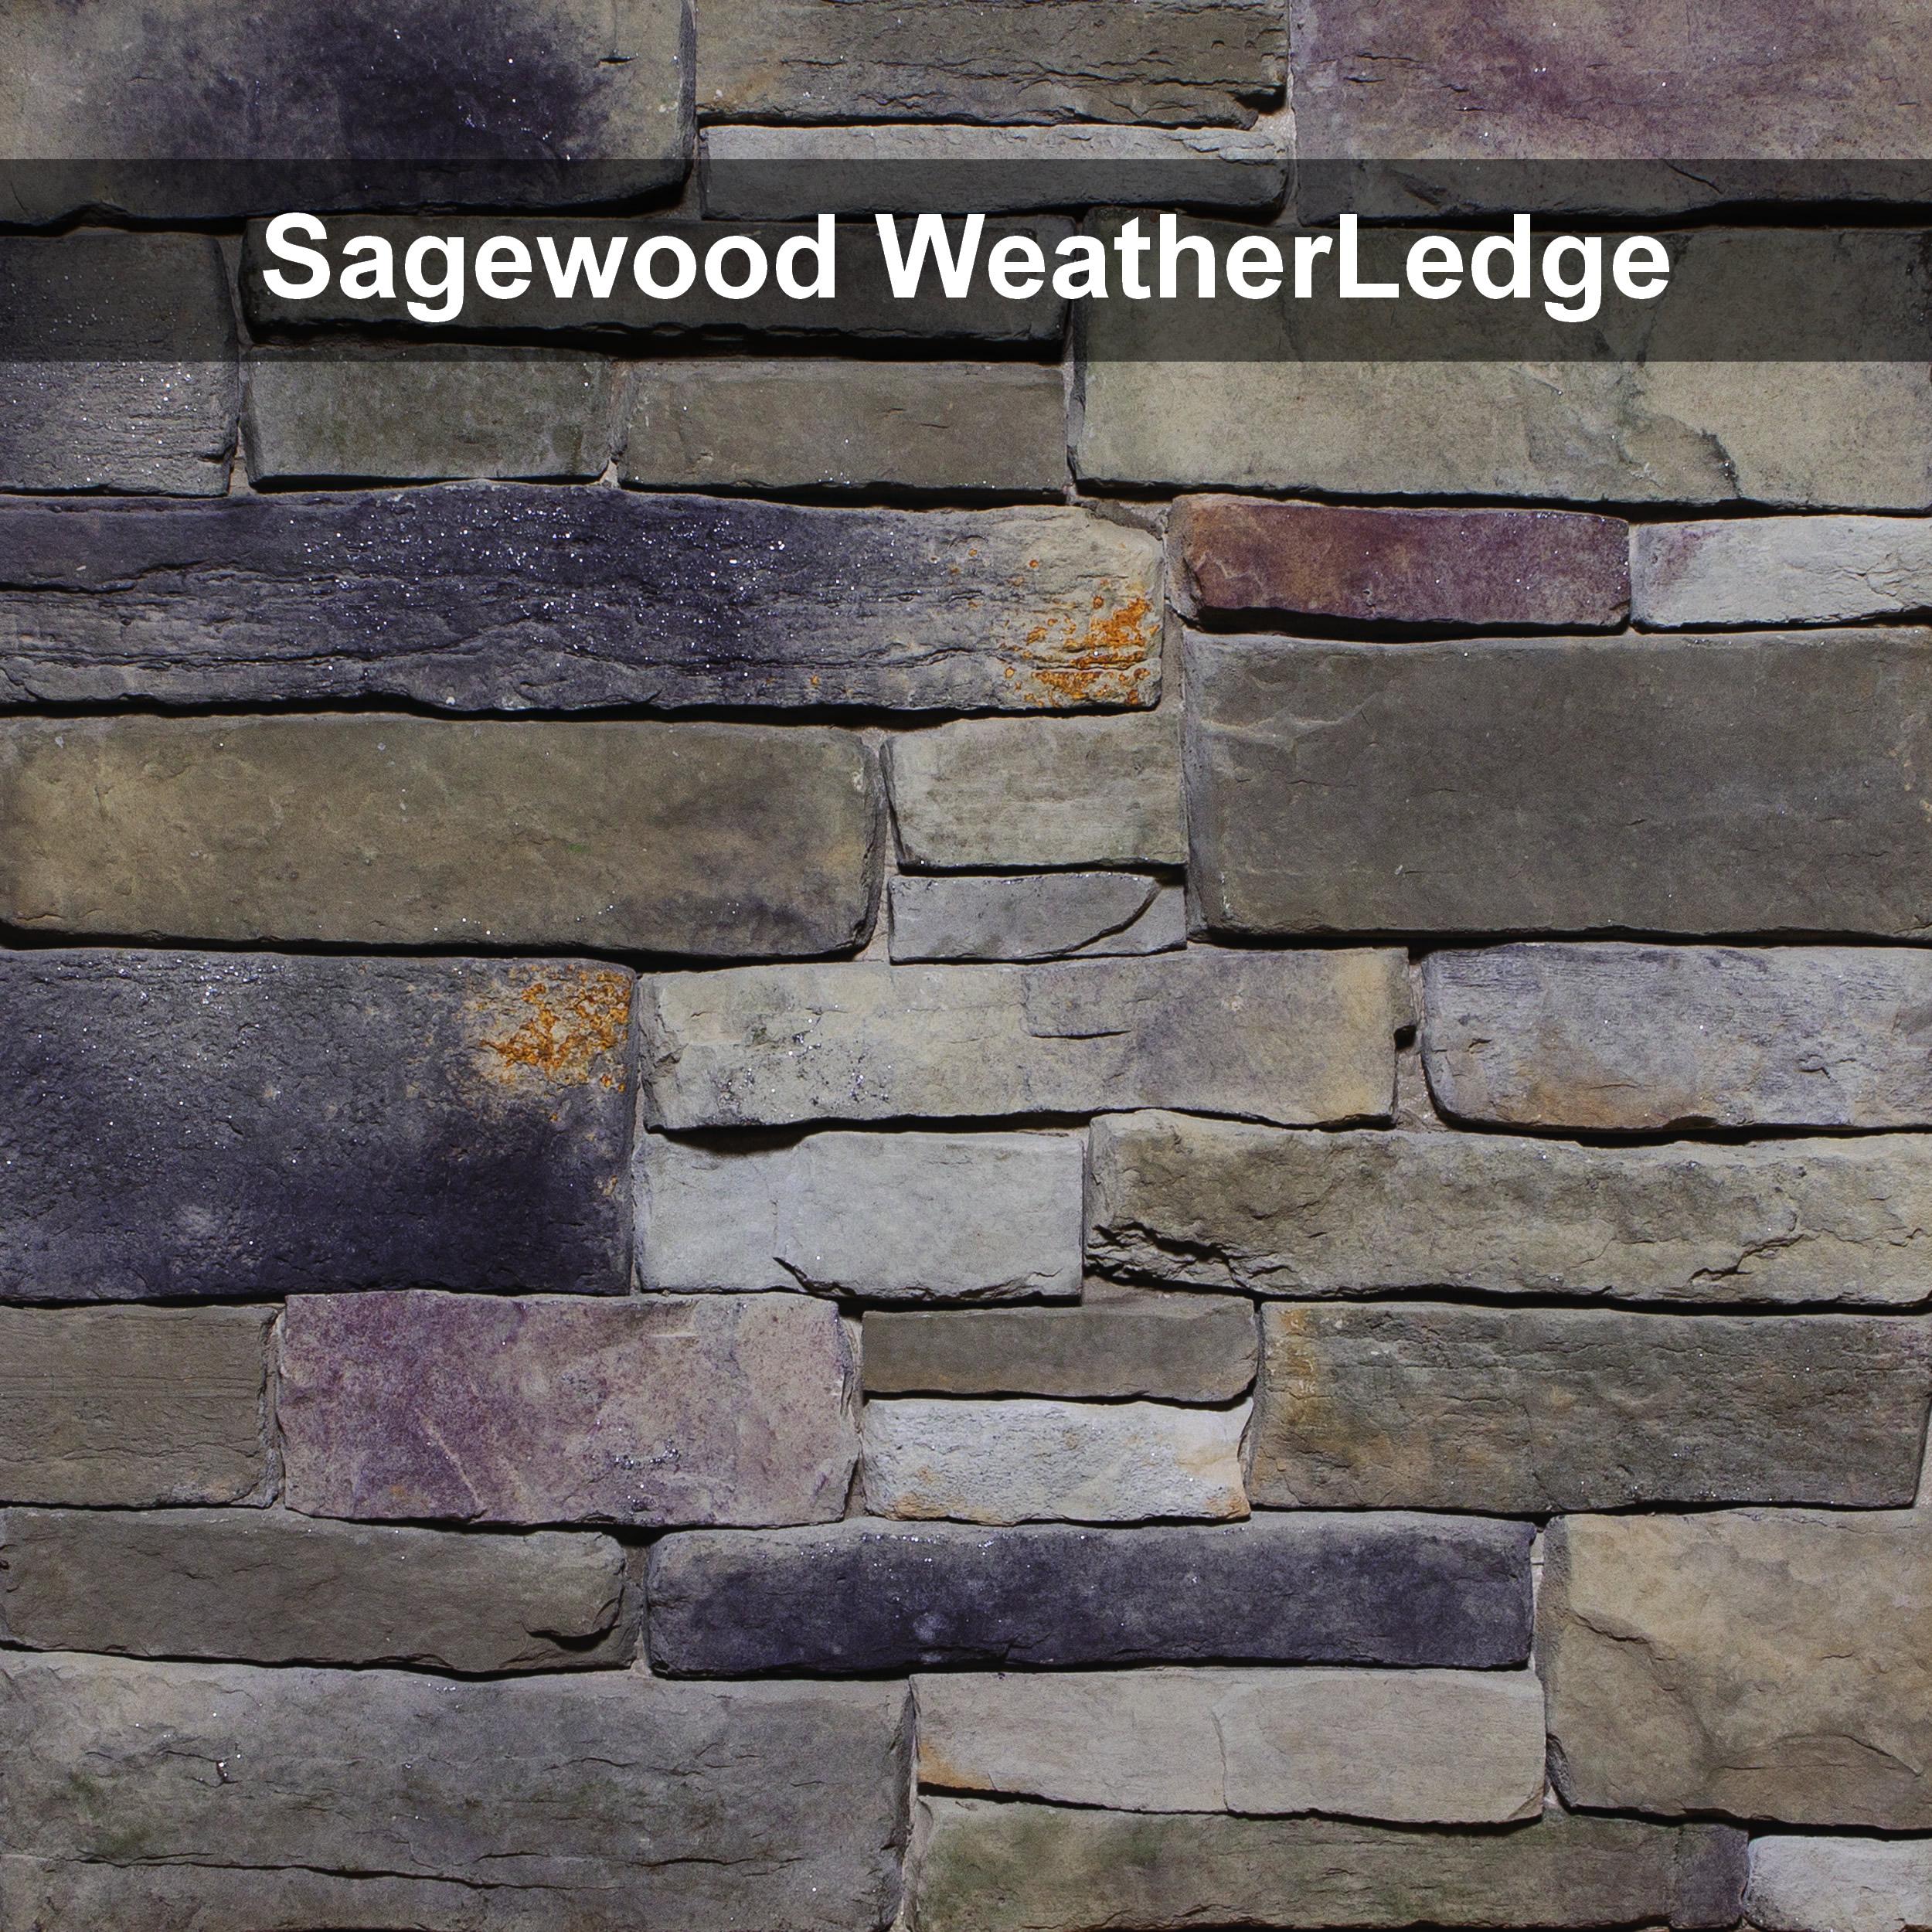 DQ_Weather Ledge_Sagewood_Profile.jpg